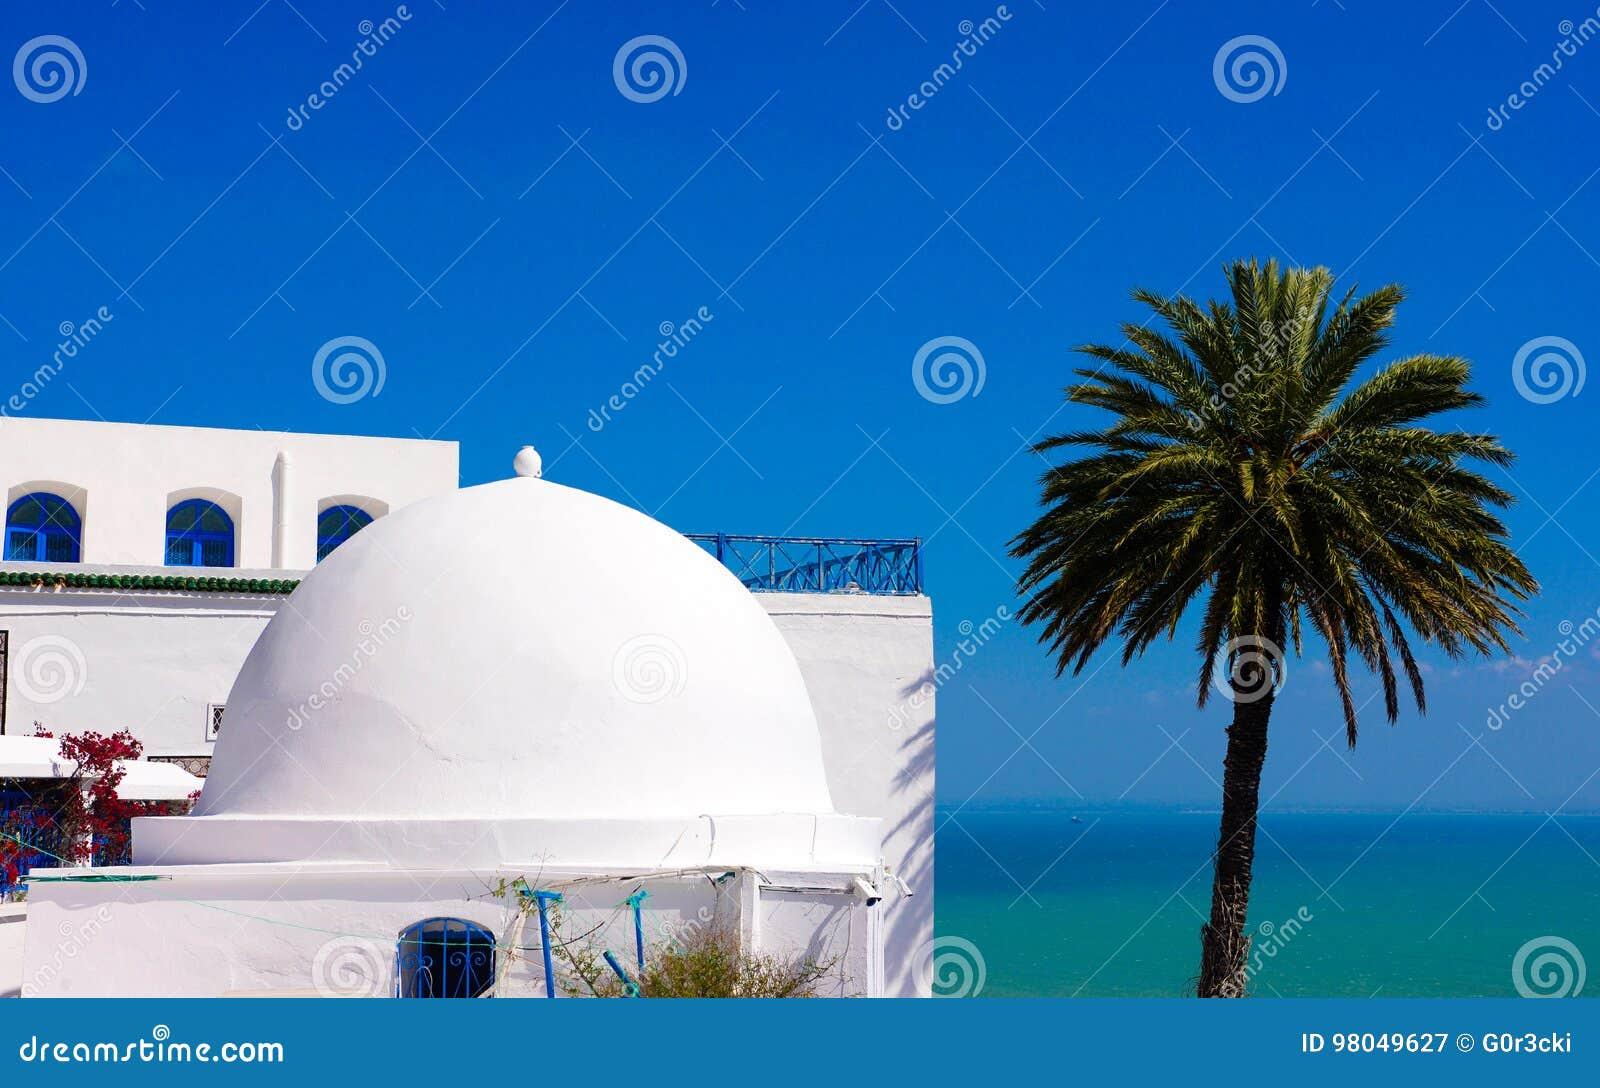 Sidi Bou Said - Mediterranean Sea and Palm Tree